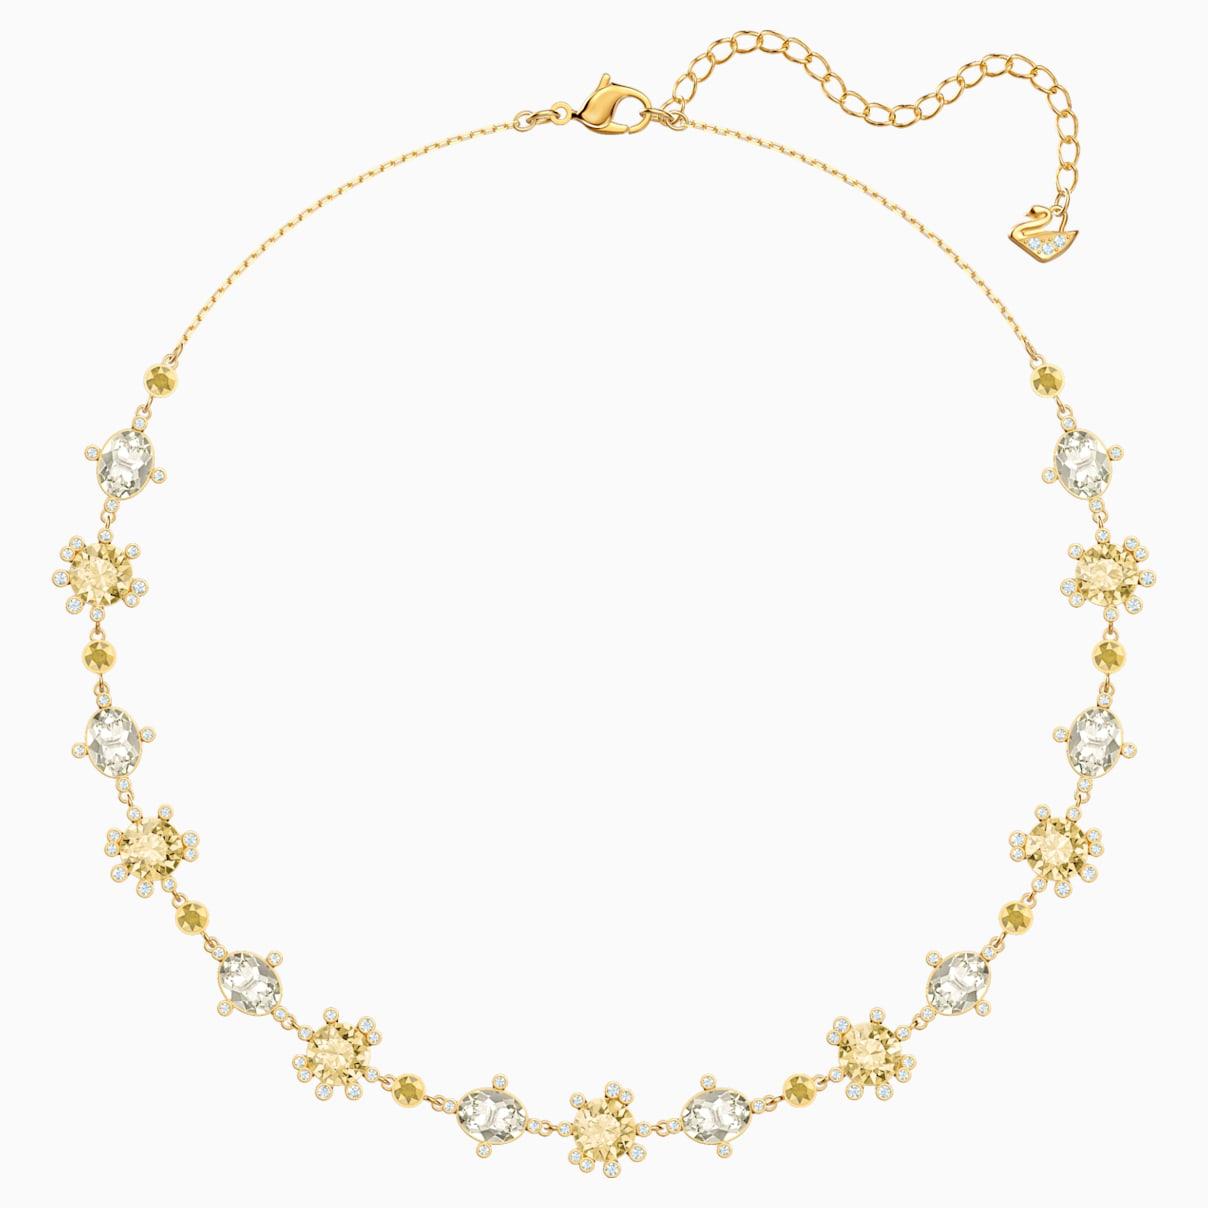 Swarovski Olive Necklace, Multi-colored, Gold-tone plated